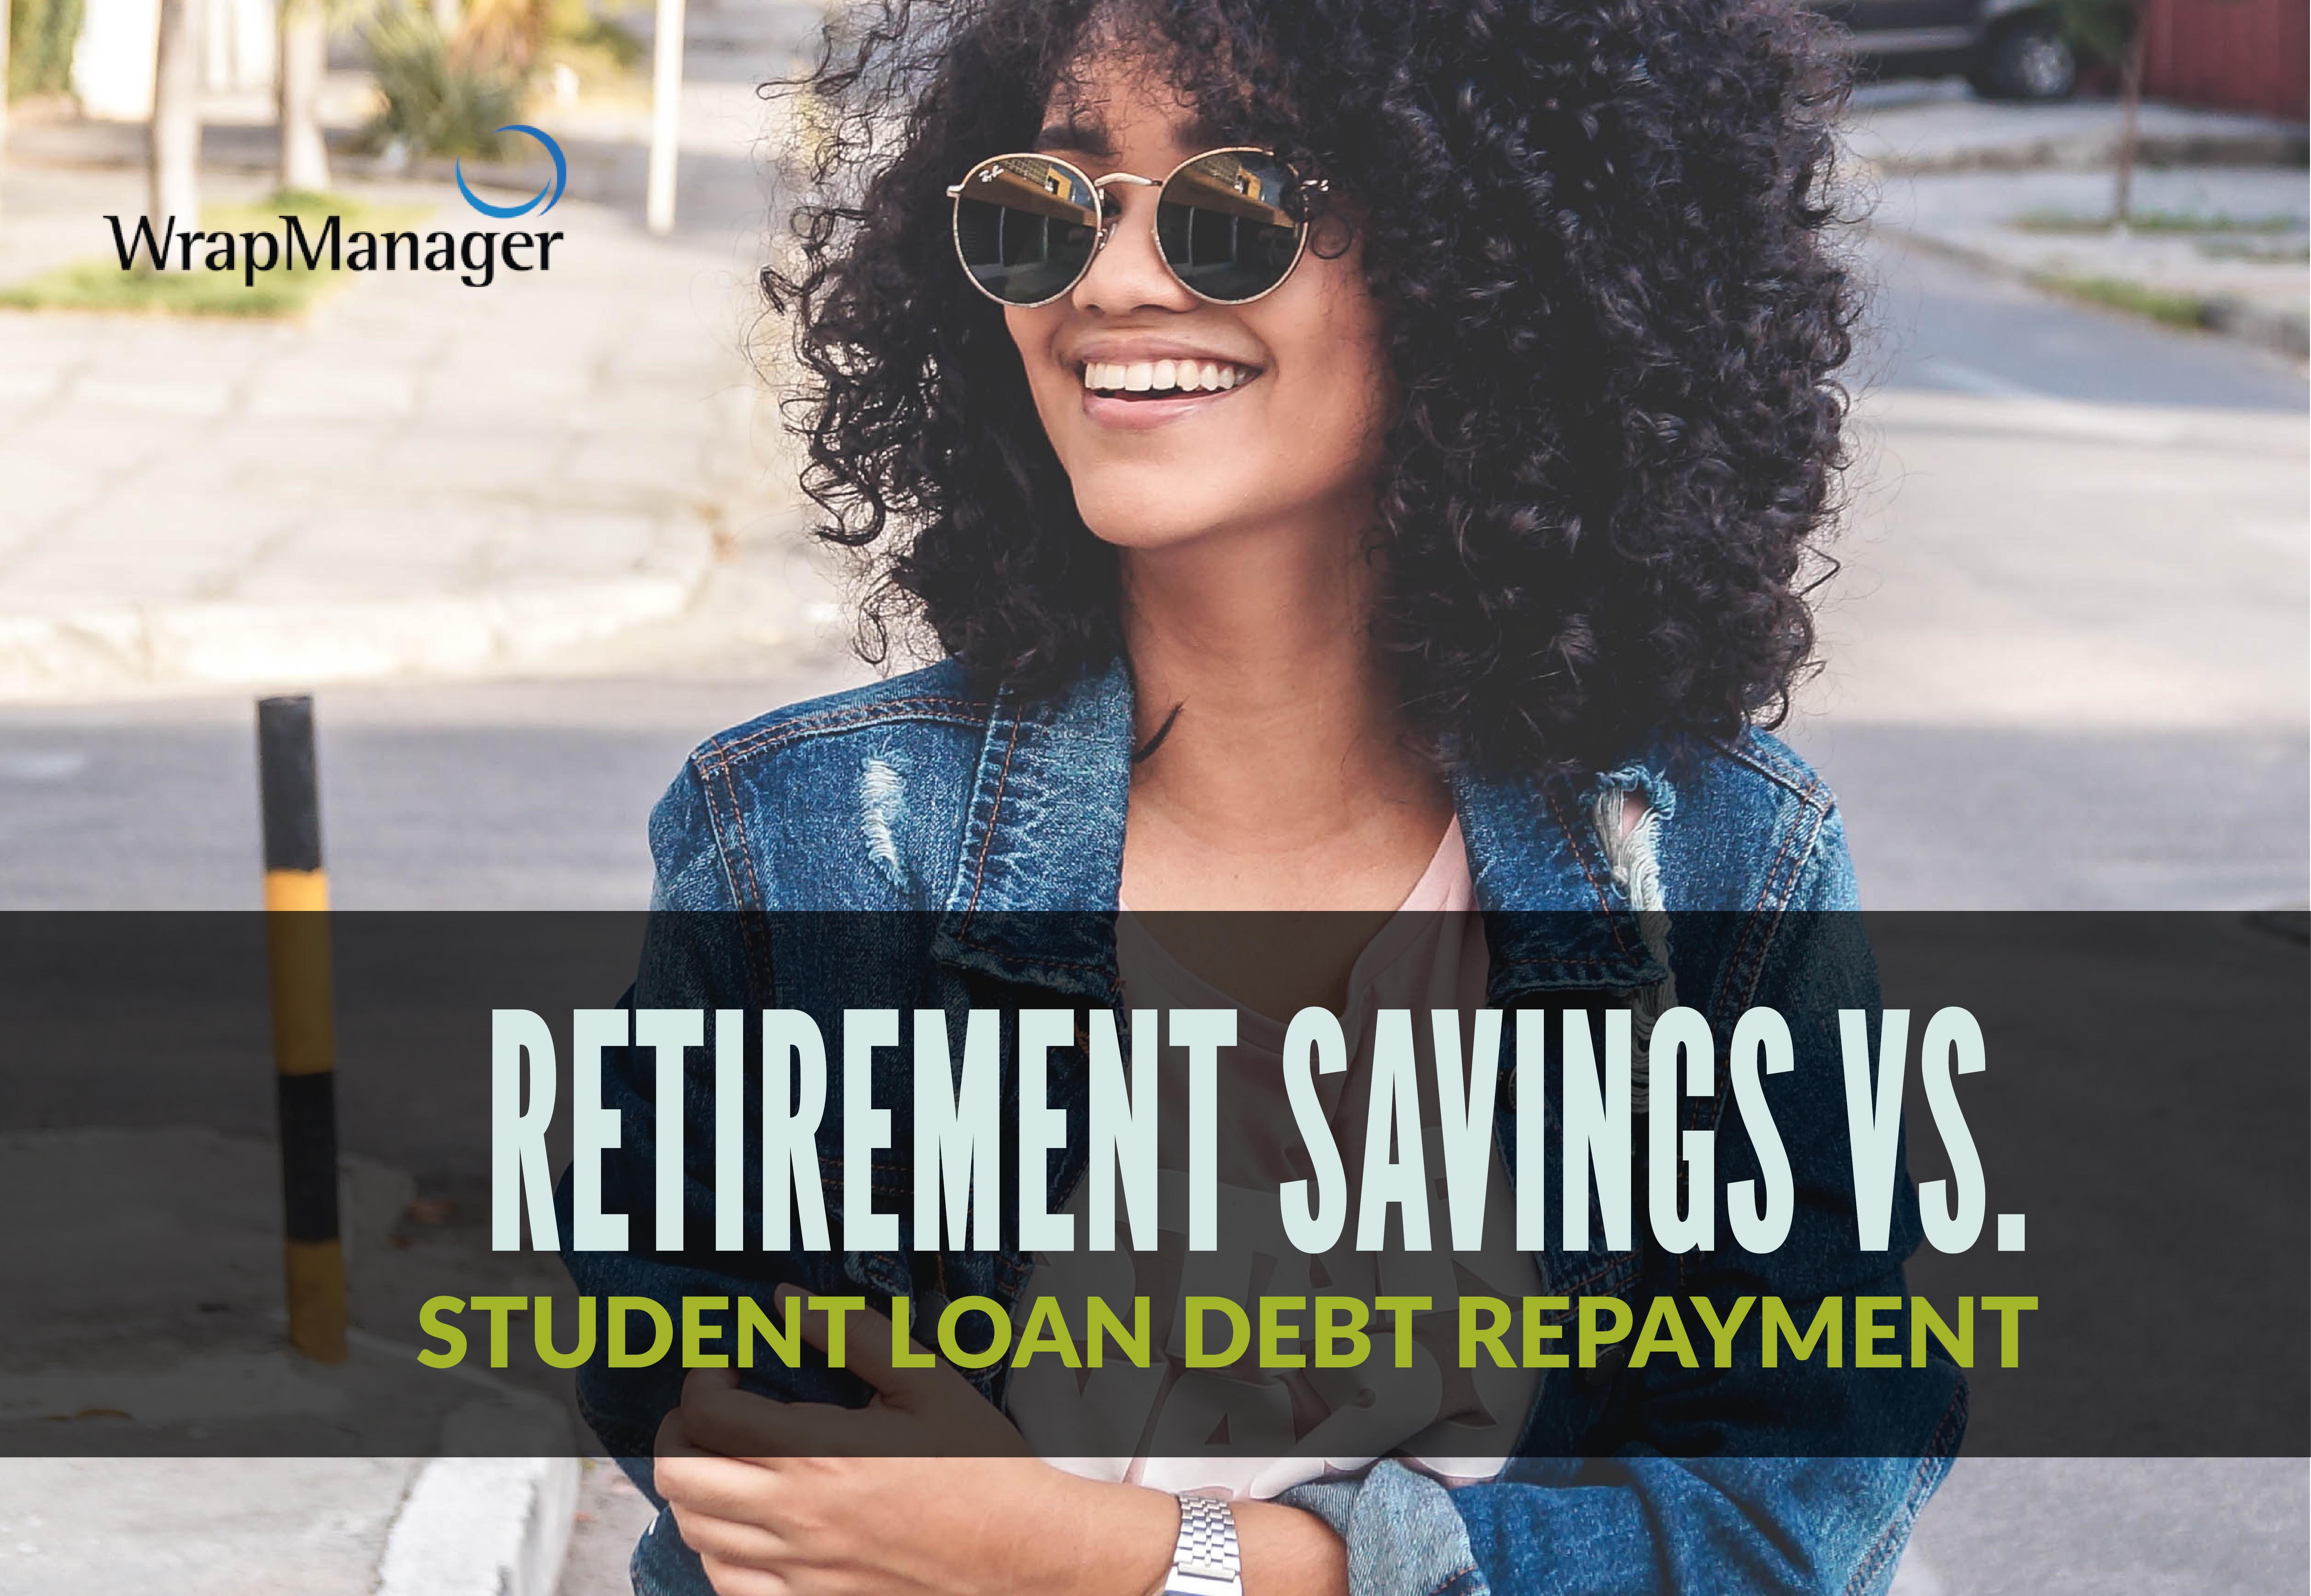 Balancing Student Loan Repayments Against Saving for Retirement